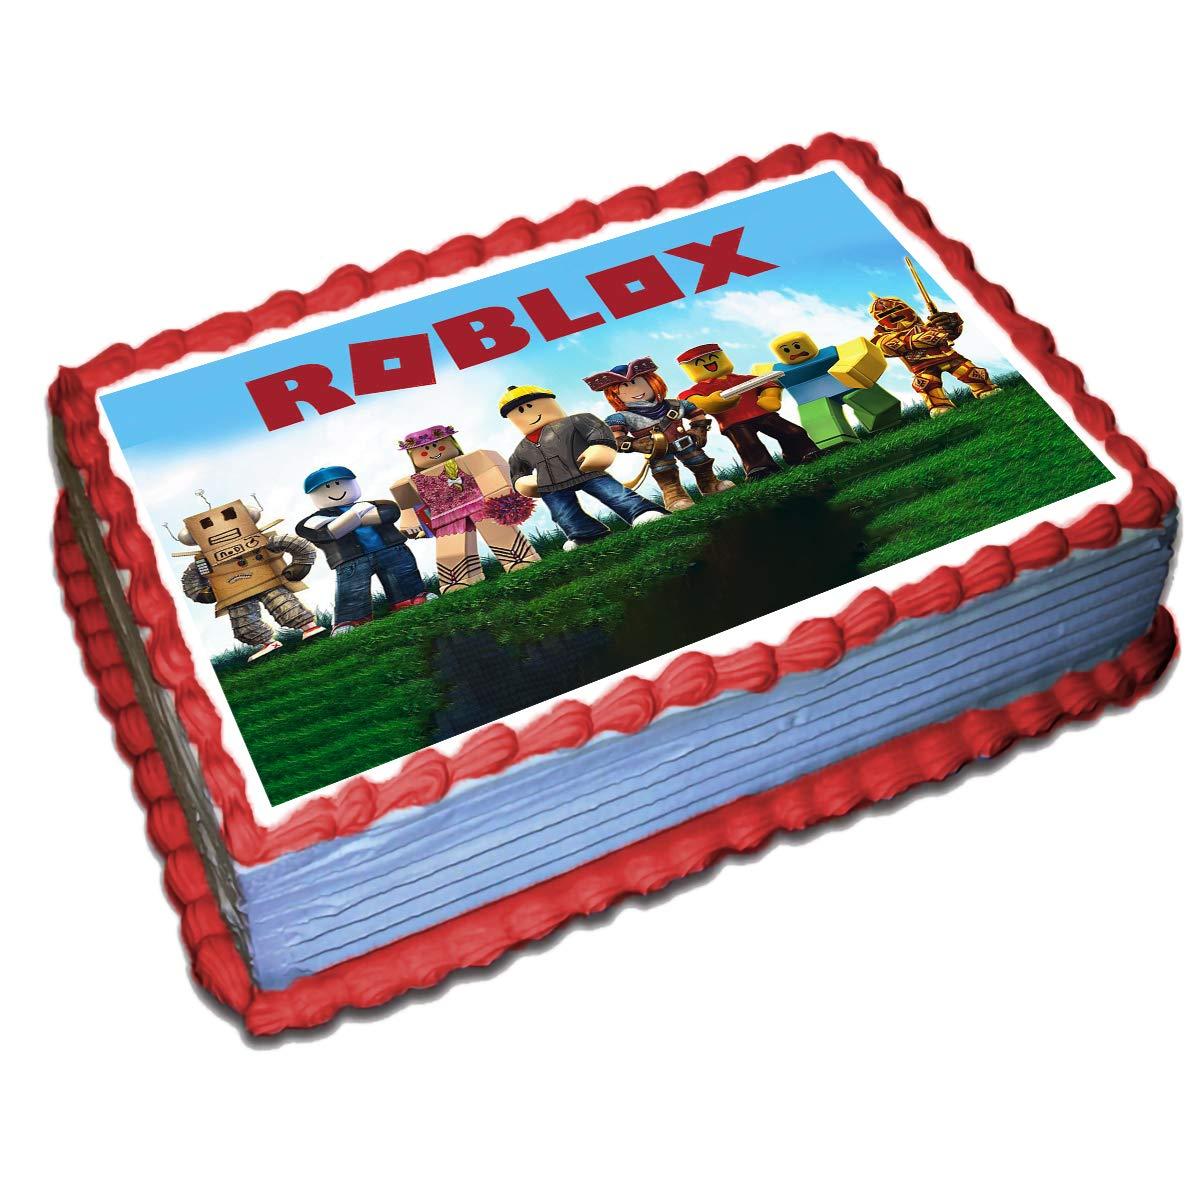 Easy Roblox Birthday Cake Ideas Amazon Com Grocery Gourmet Food